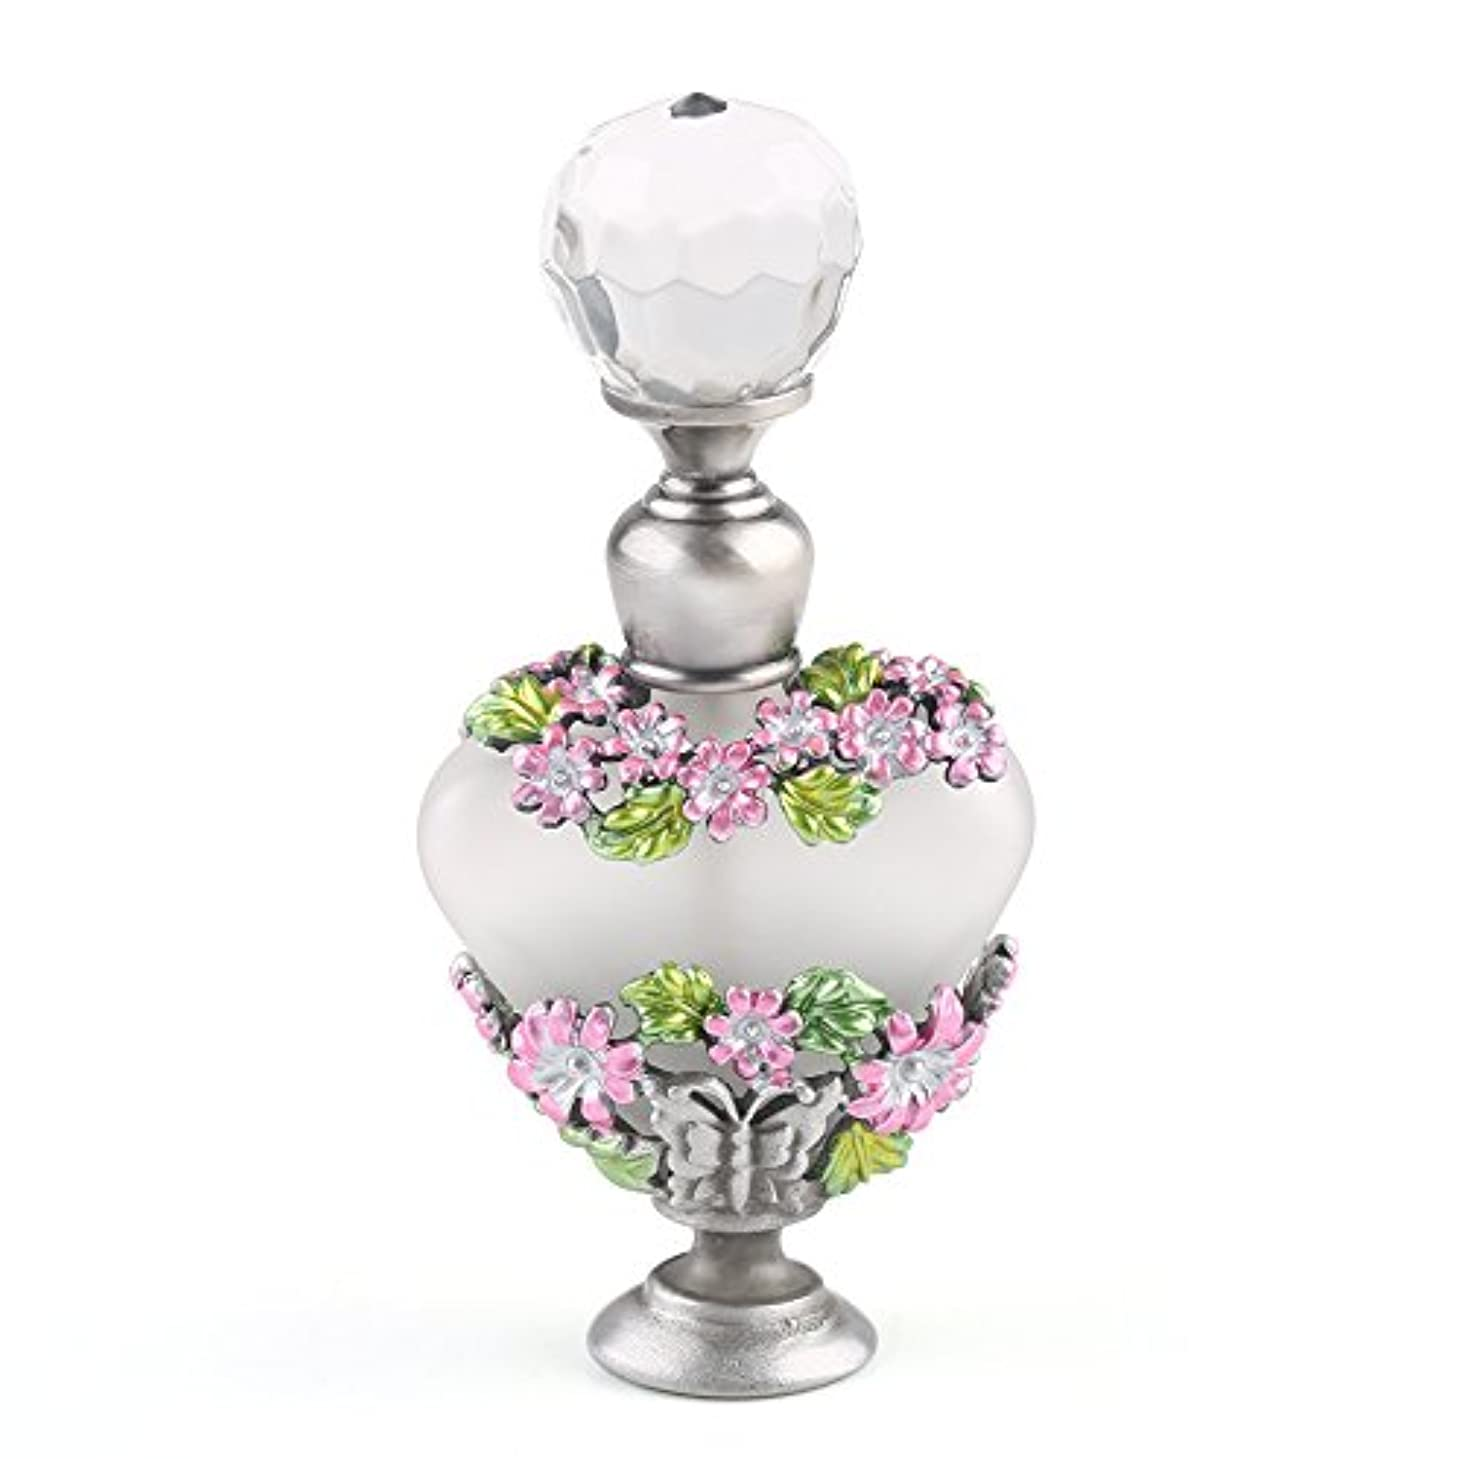 VERY100 高品質 美しい香水瓶/アロマボトル 5ML アロマオイル用瓶 綺麗アンティーク調 フラワーデザイン プレゼント 結婚式 飾り 58778